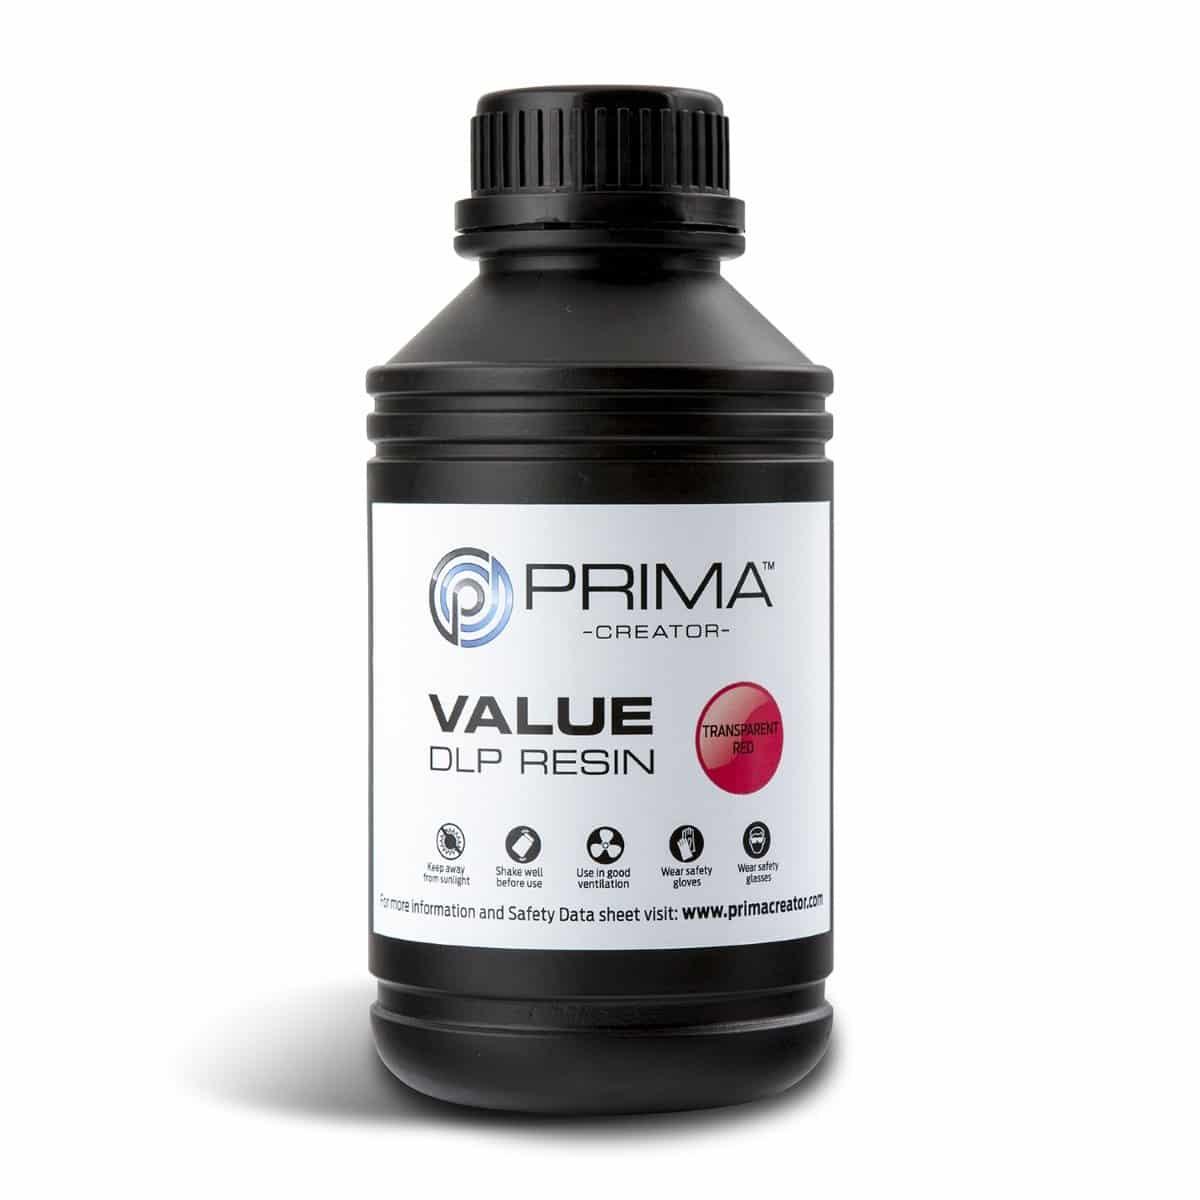 Image of PrimaCreator Value UV / DLP Resin - 500 ml - Transparent Red